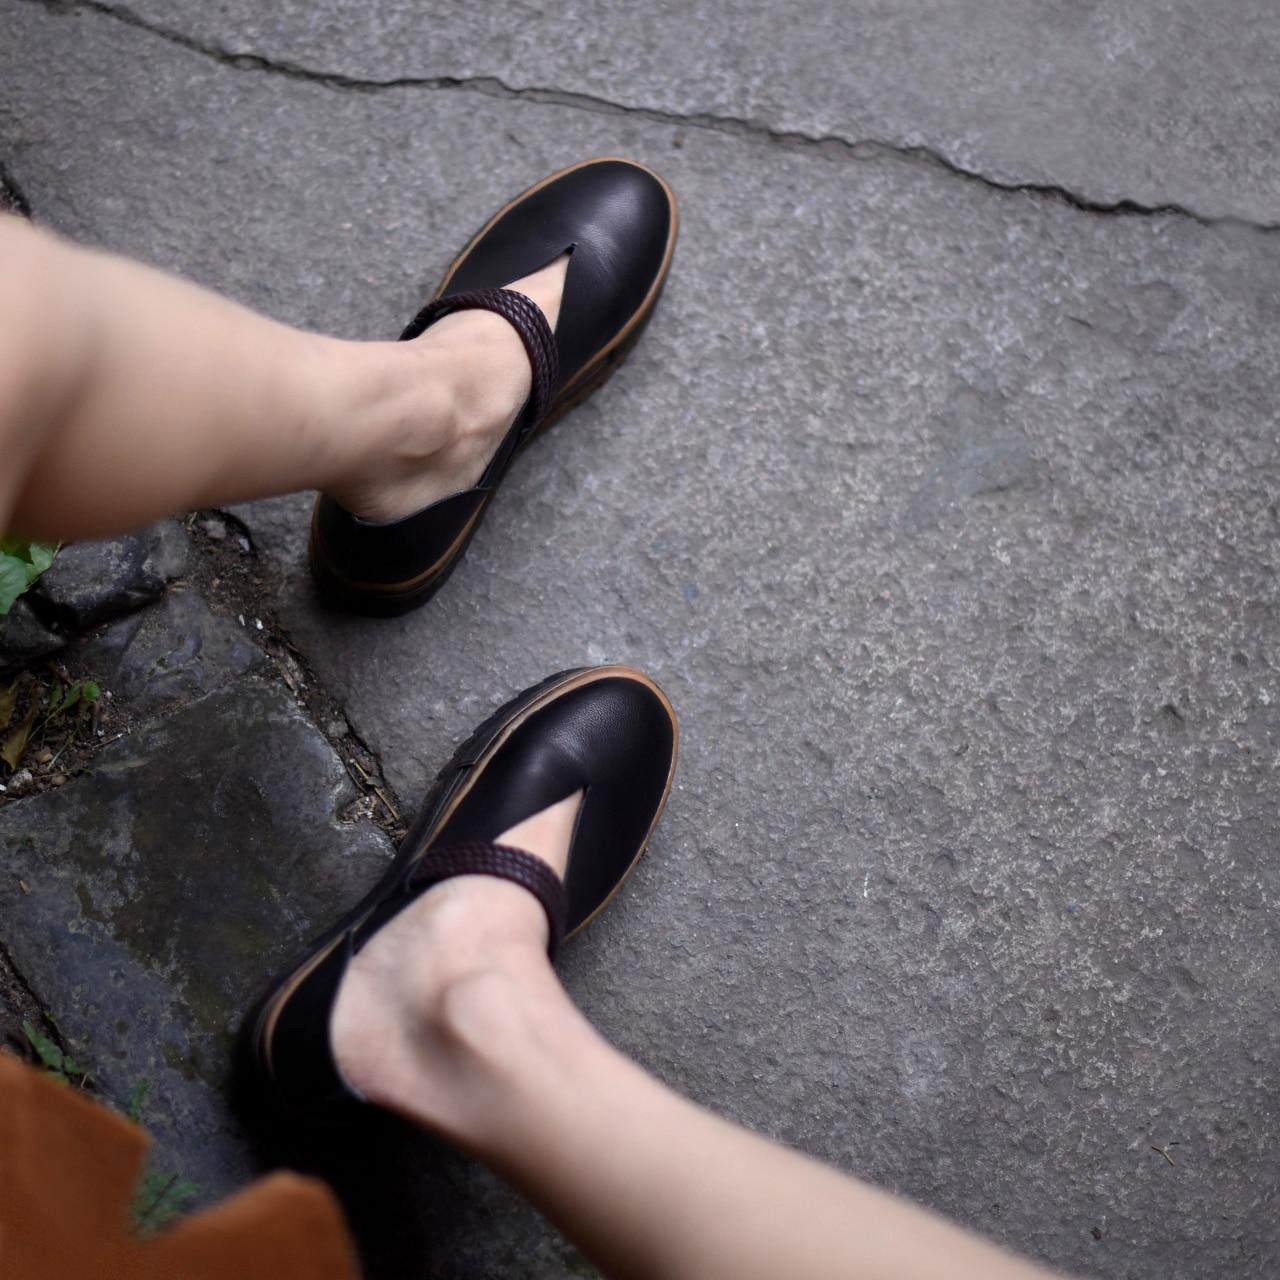 Original Art 806 6 Main Peu Nouvelle Cuir Véritable Imperméables Femmes Profonde Black 2018 gray Printemps Bouche Chaussures Artdiya Épaisse En Semelle d5TxUdwf